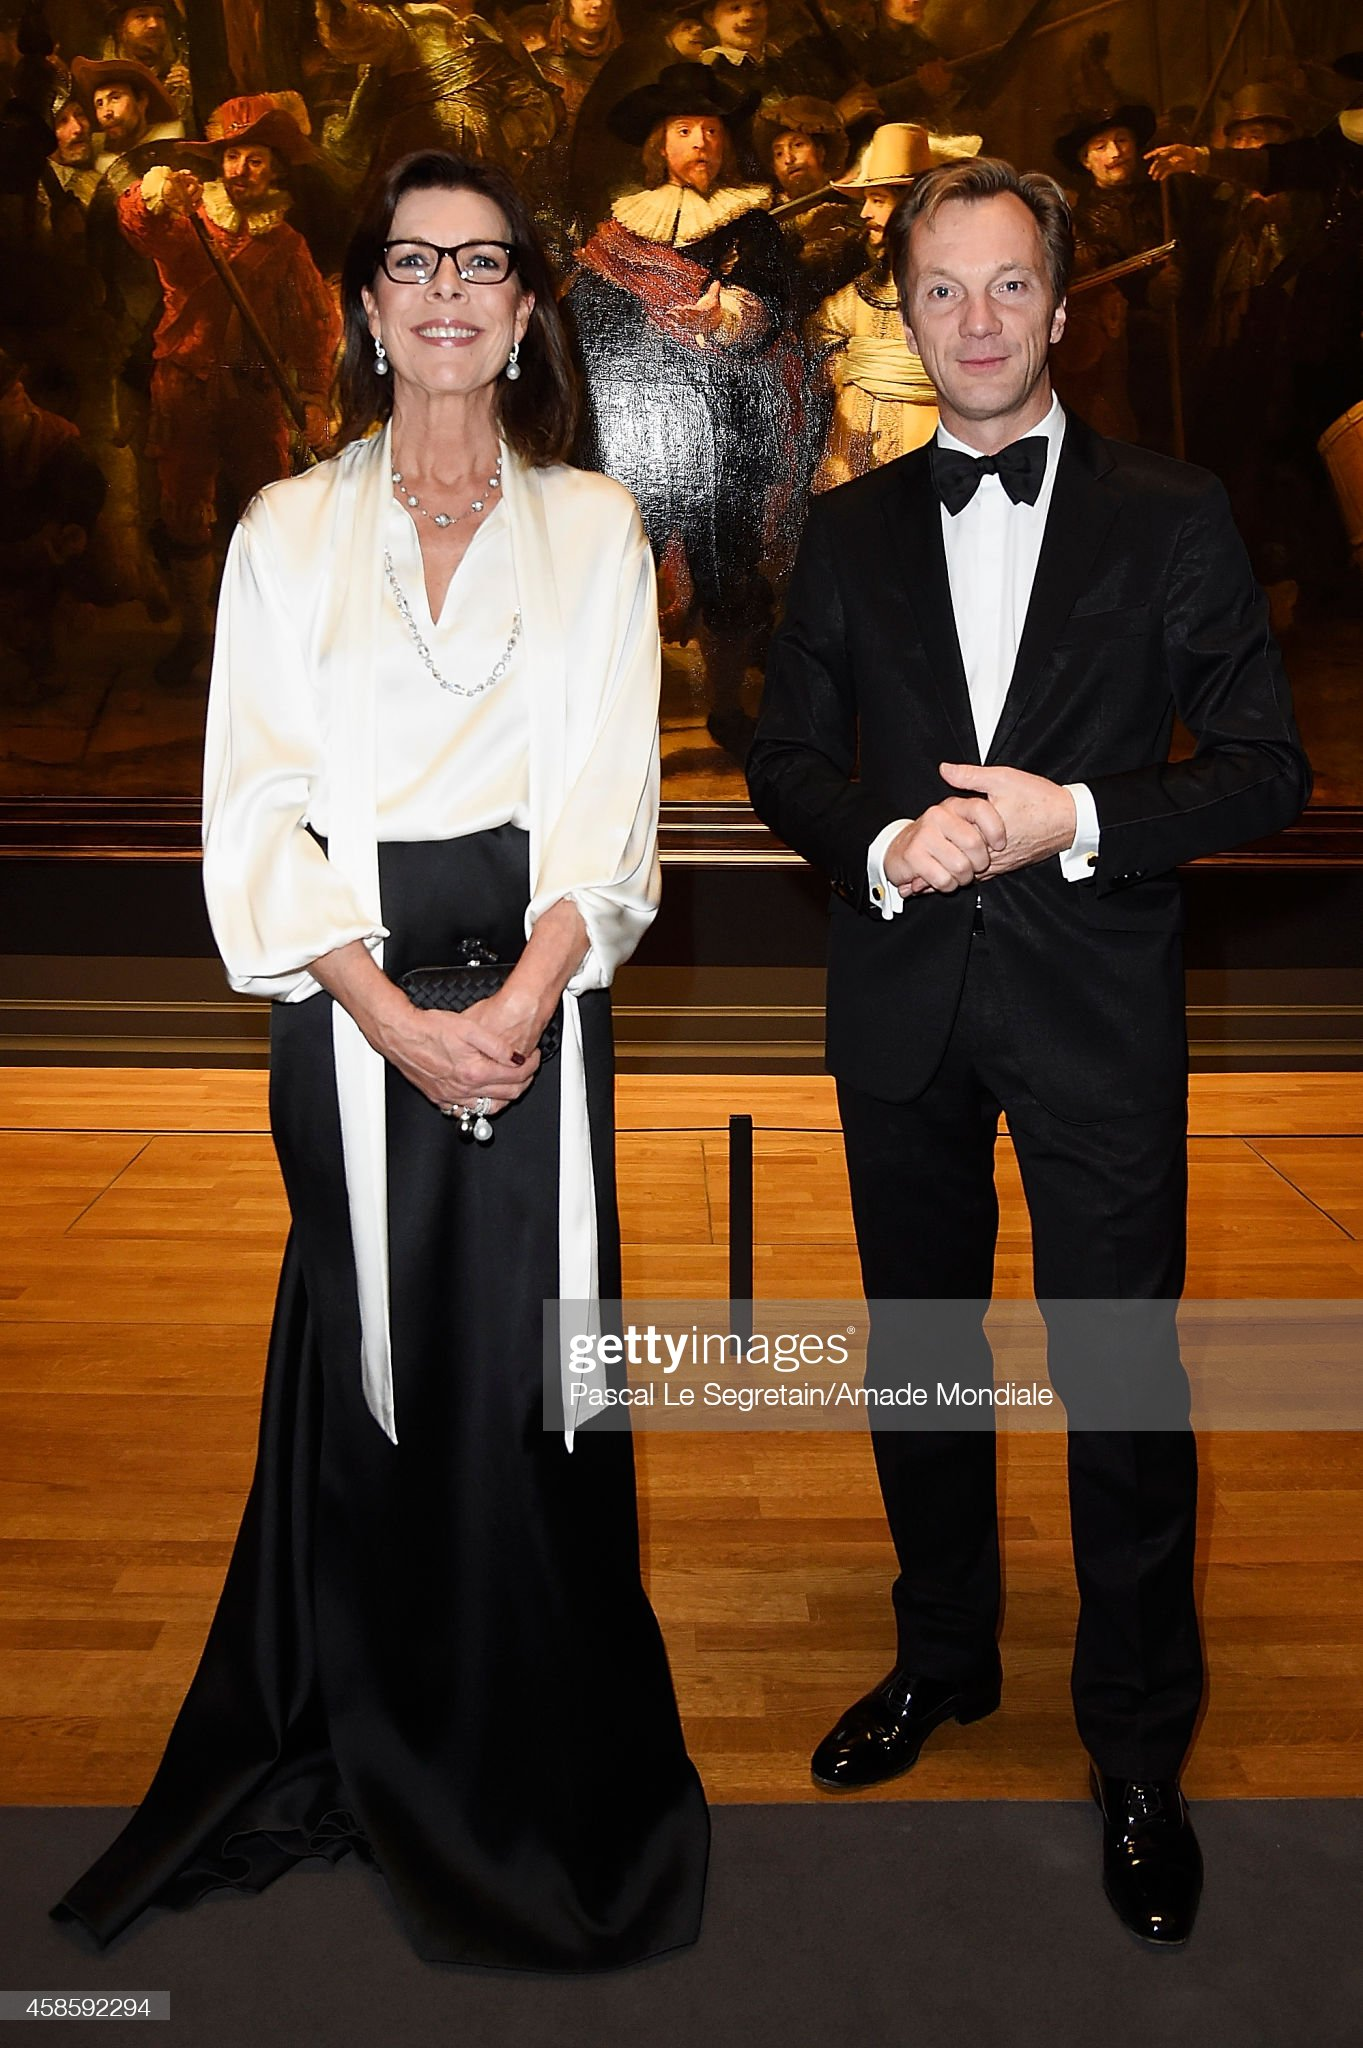 Вечерние наряды Принцессы Каролины. 'AMADE' : Netherlands Launch Gala In Amsterdam : News Photo